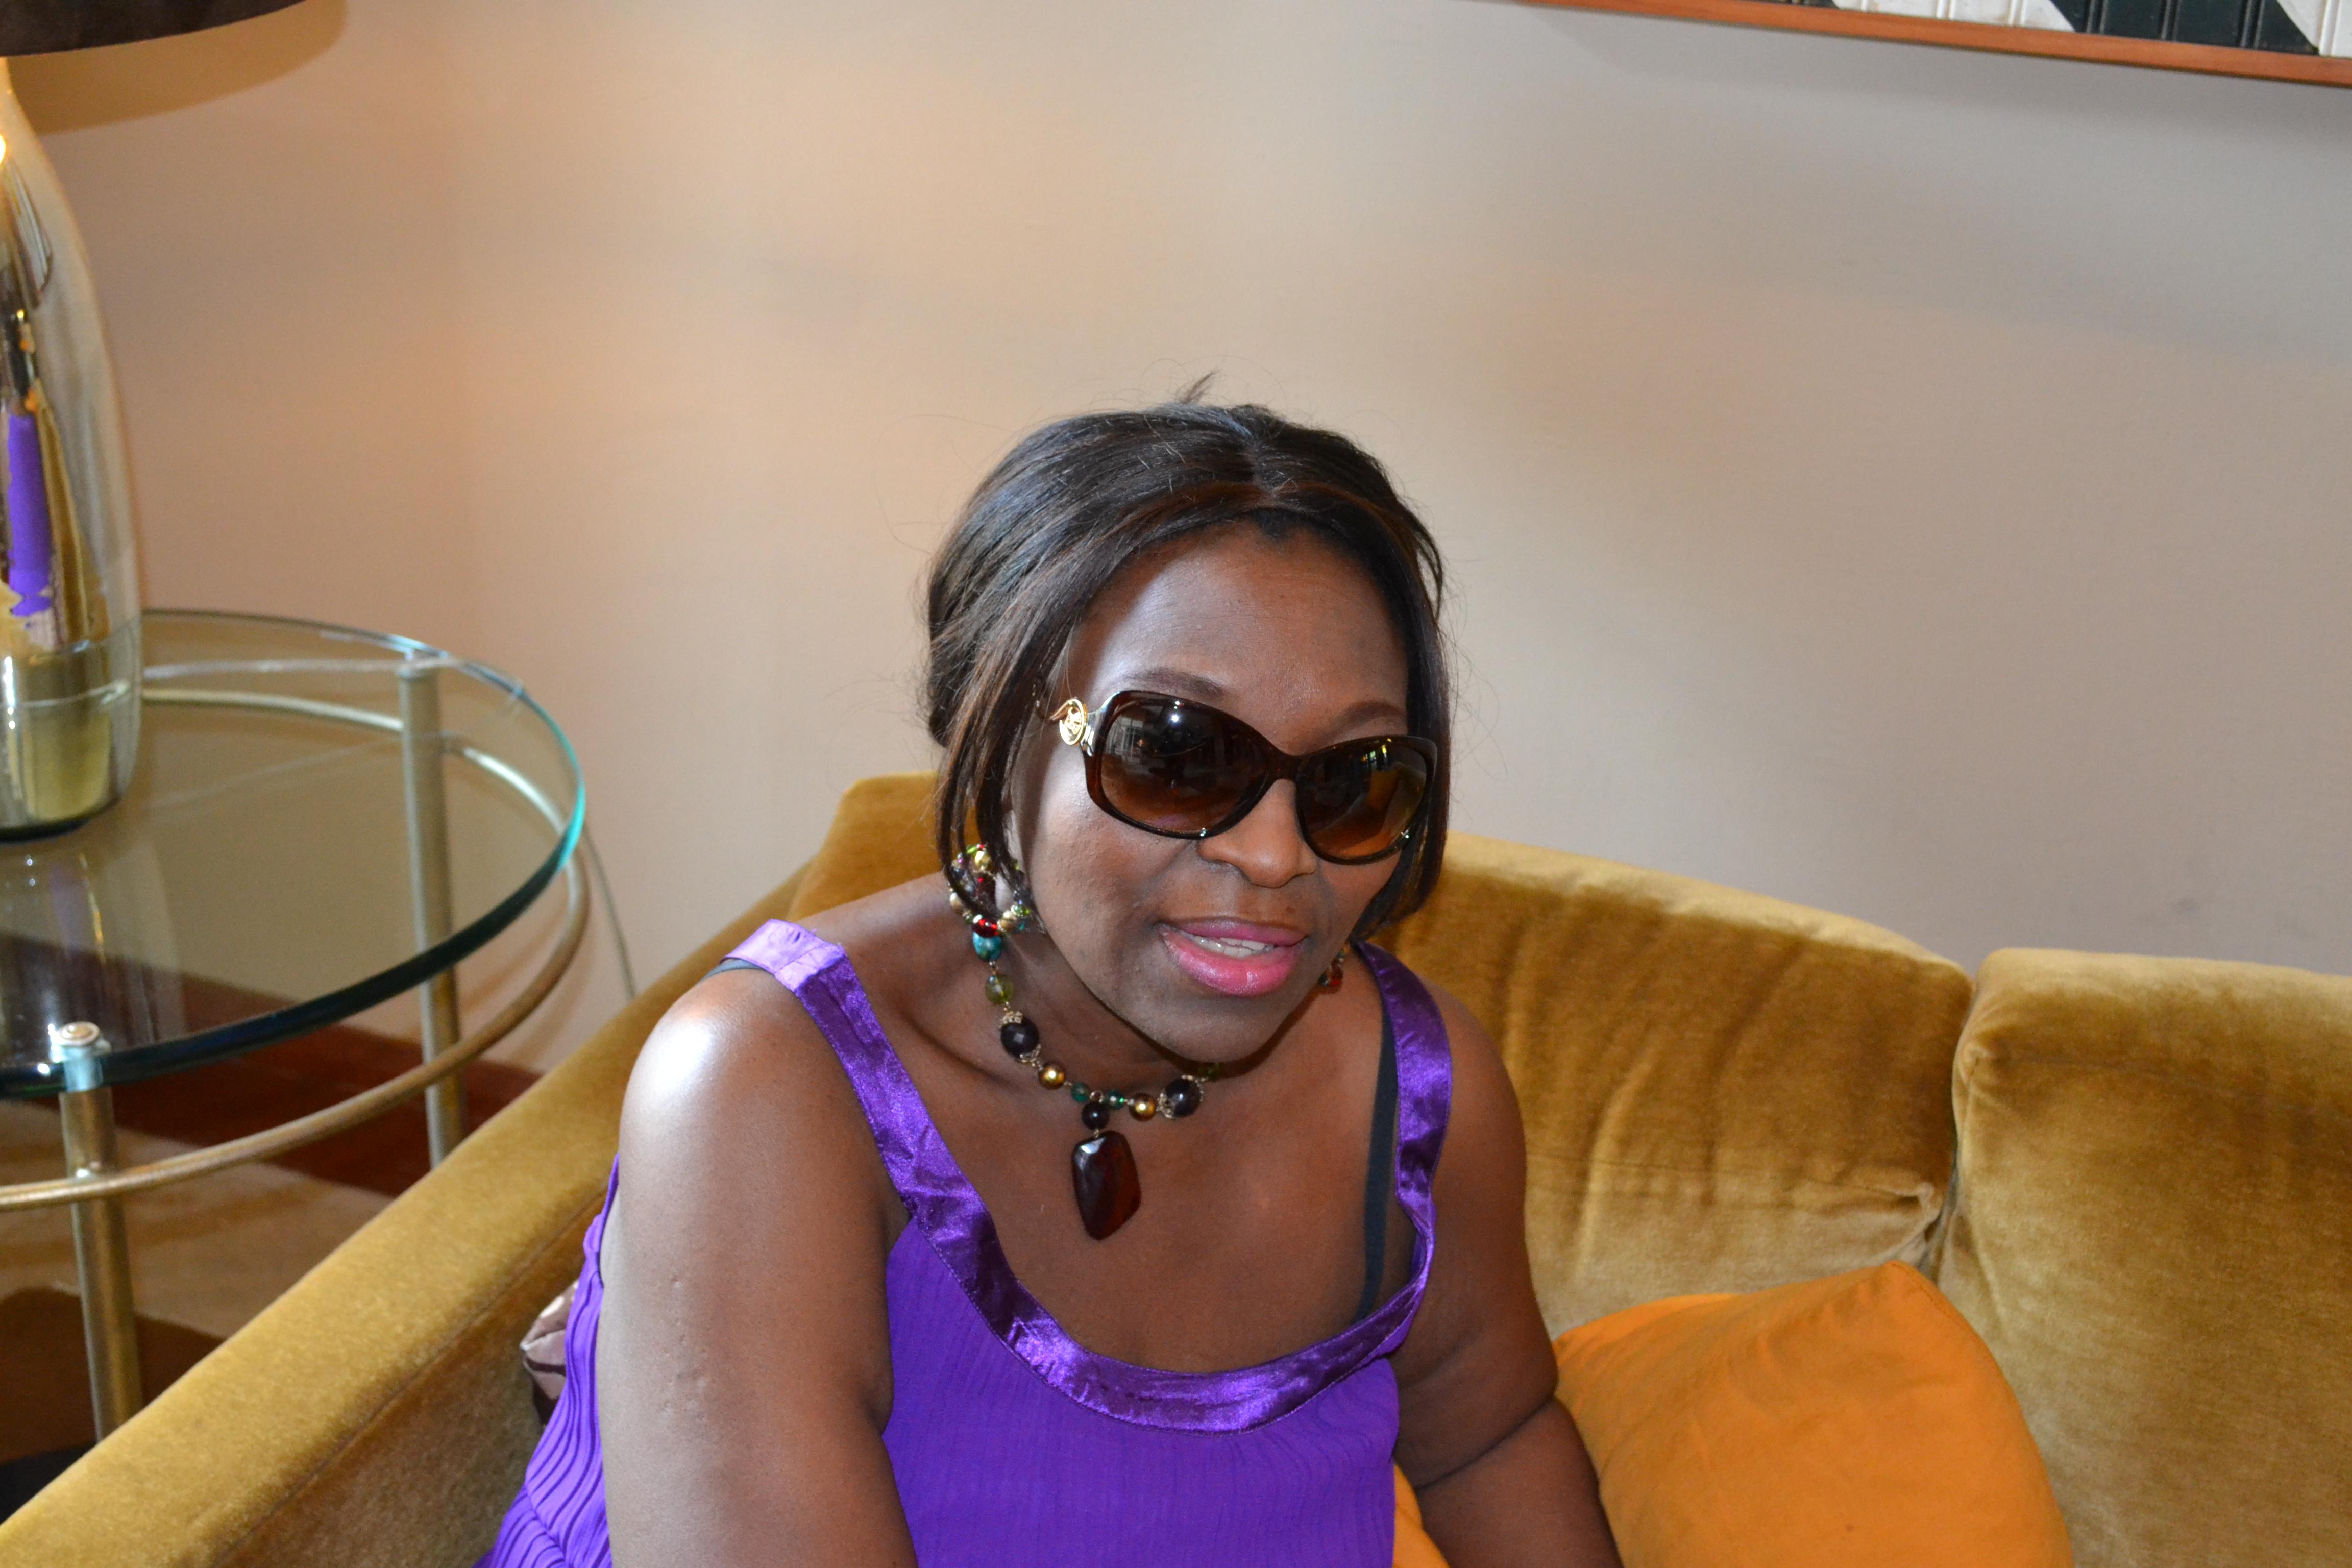 (C) 2013 Princess of Suburbia